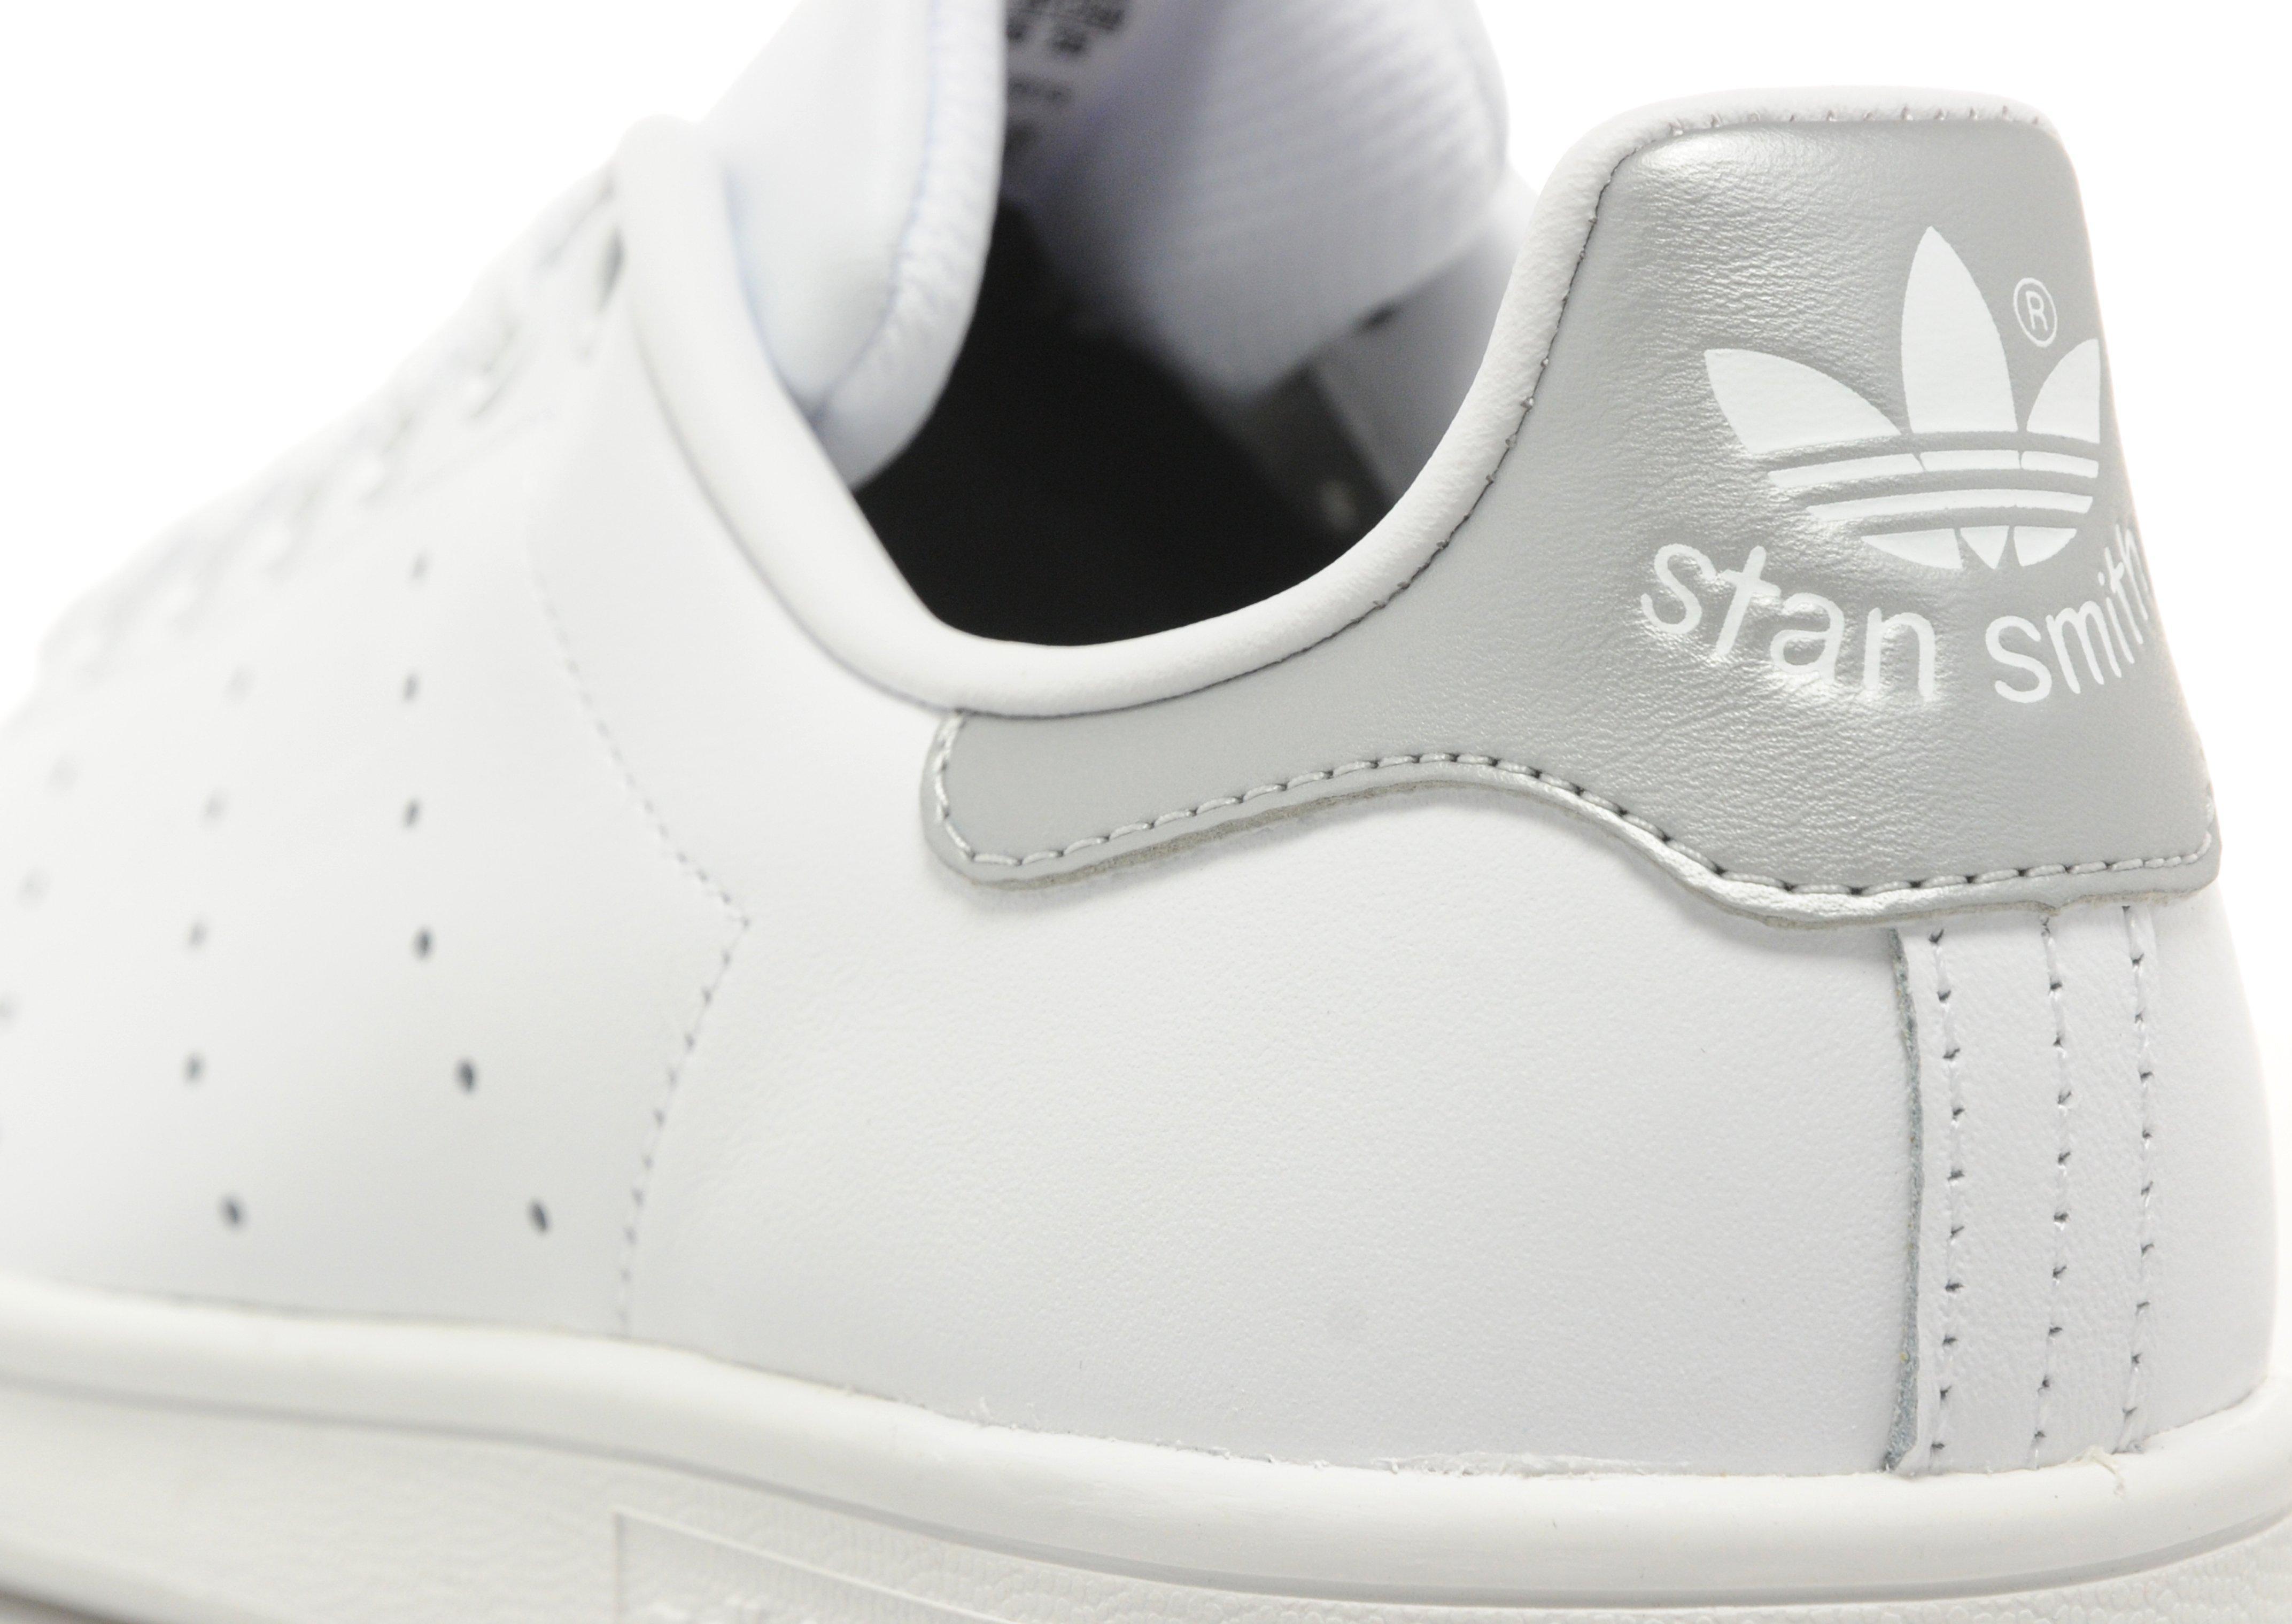 ... adidas Originals Stan Smith Women\u0027s